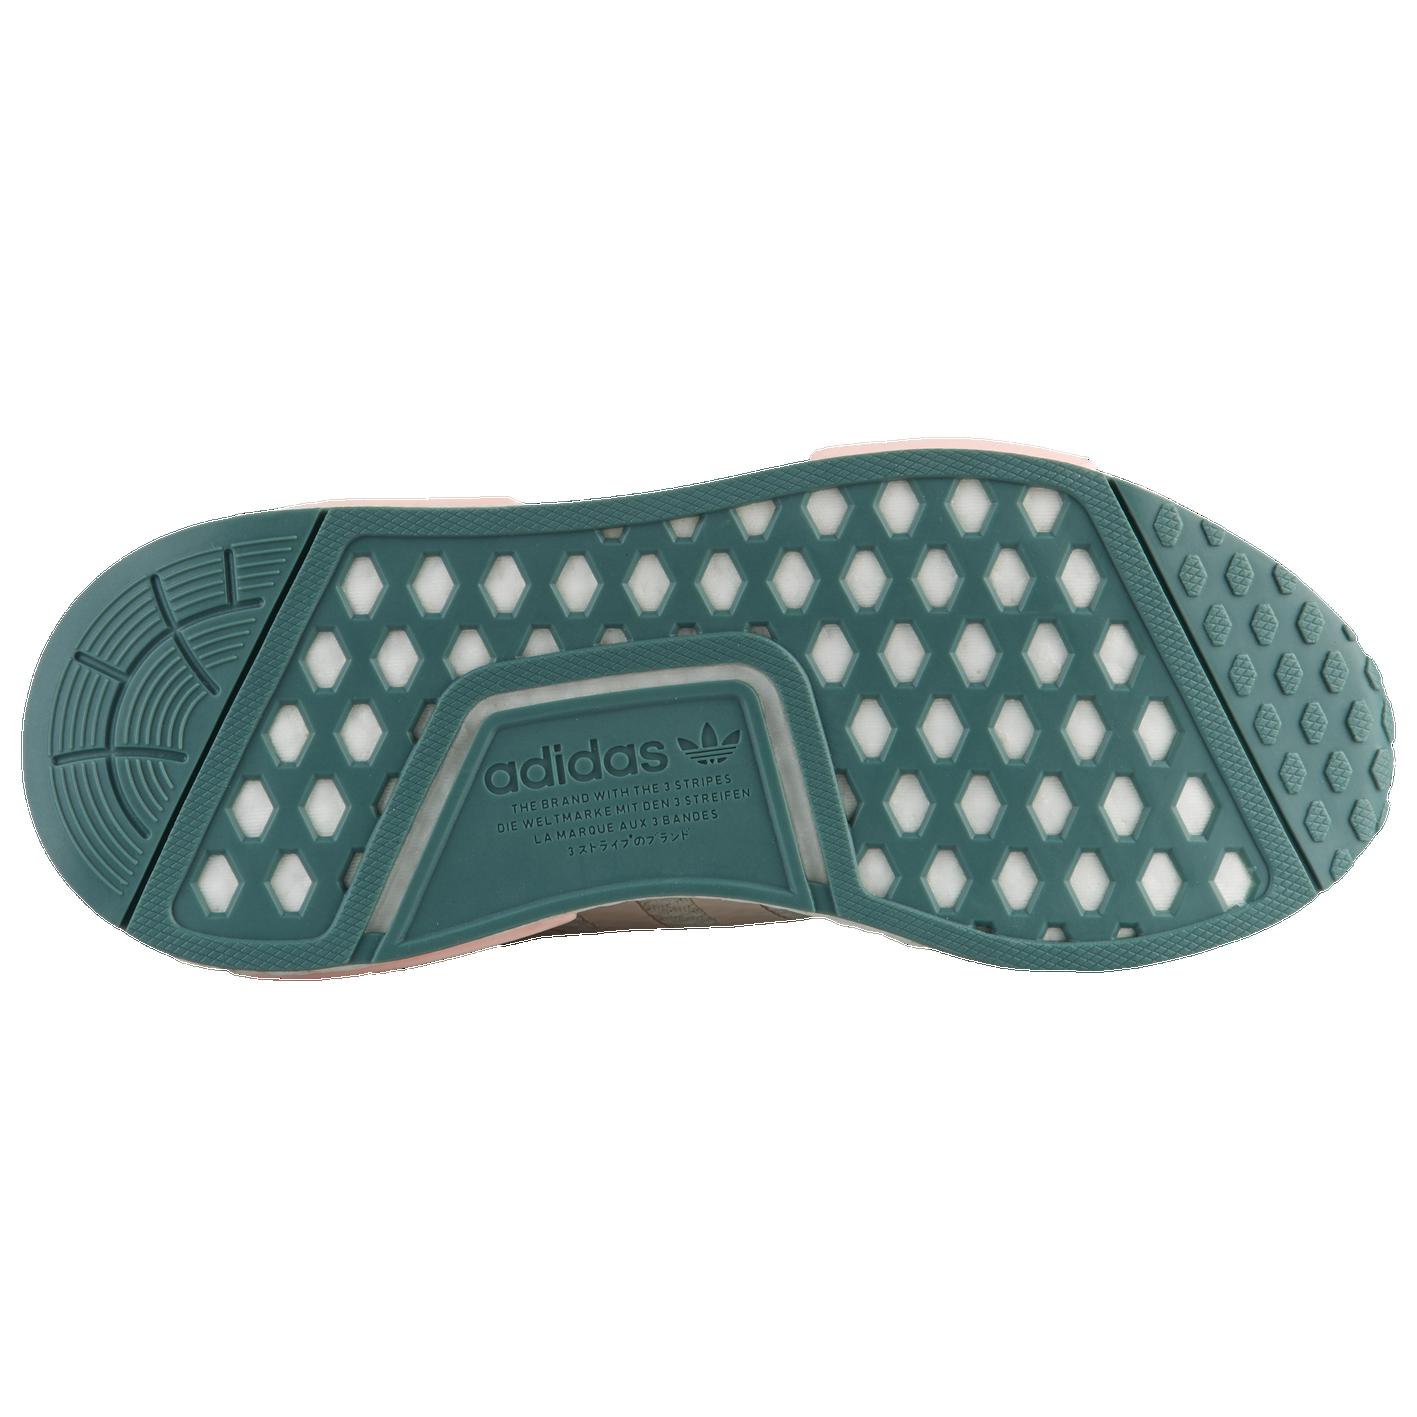 0fdca2b36111d adidas Originals NMD R1 - Women s - Casual - Shoes - Cloud White ...